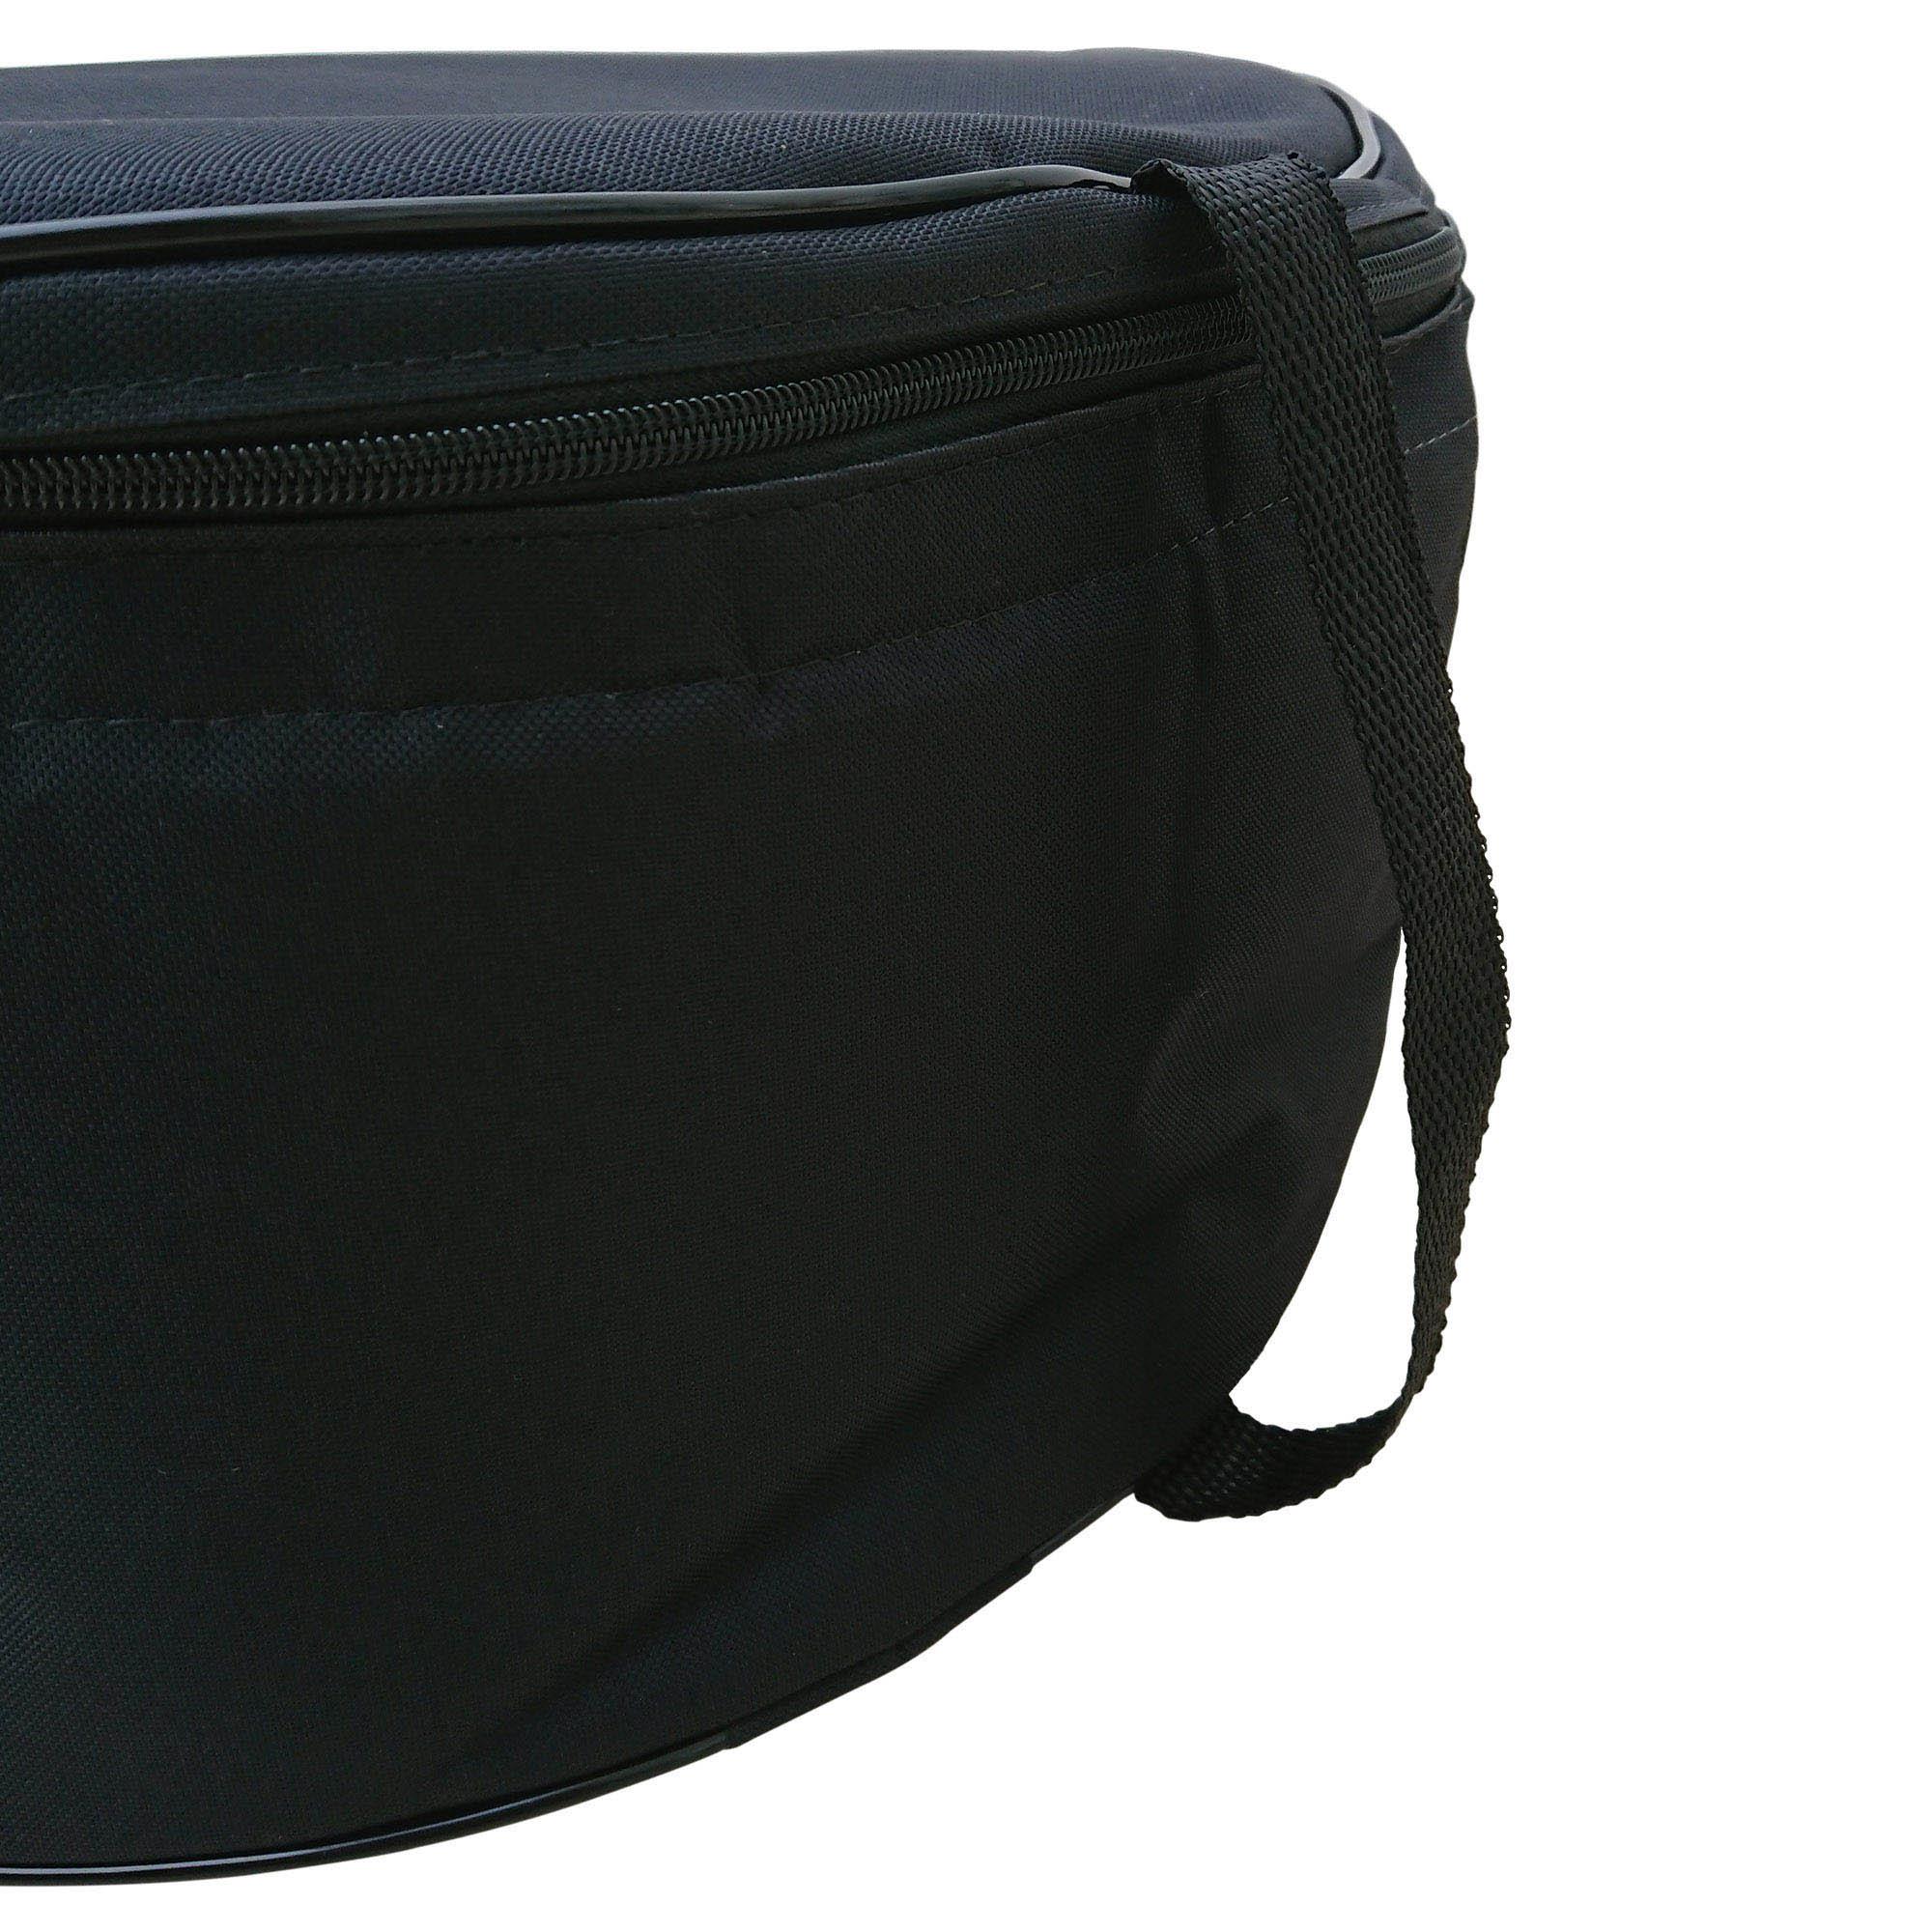 "Capa Bag Extra Luxo para Caixa 14"" x 18cm  - ROOSTERMUSIC"